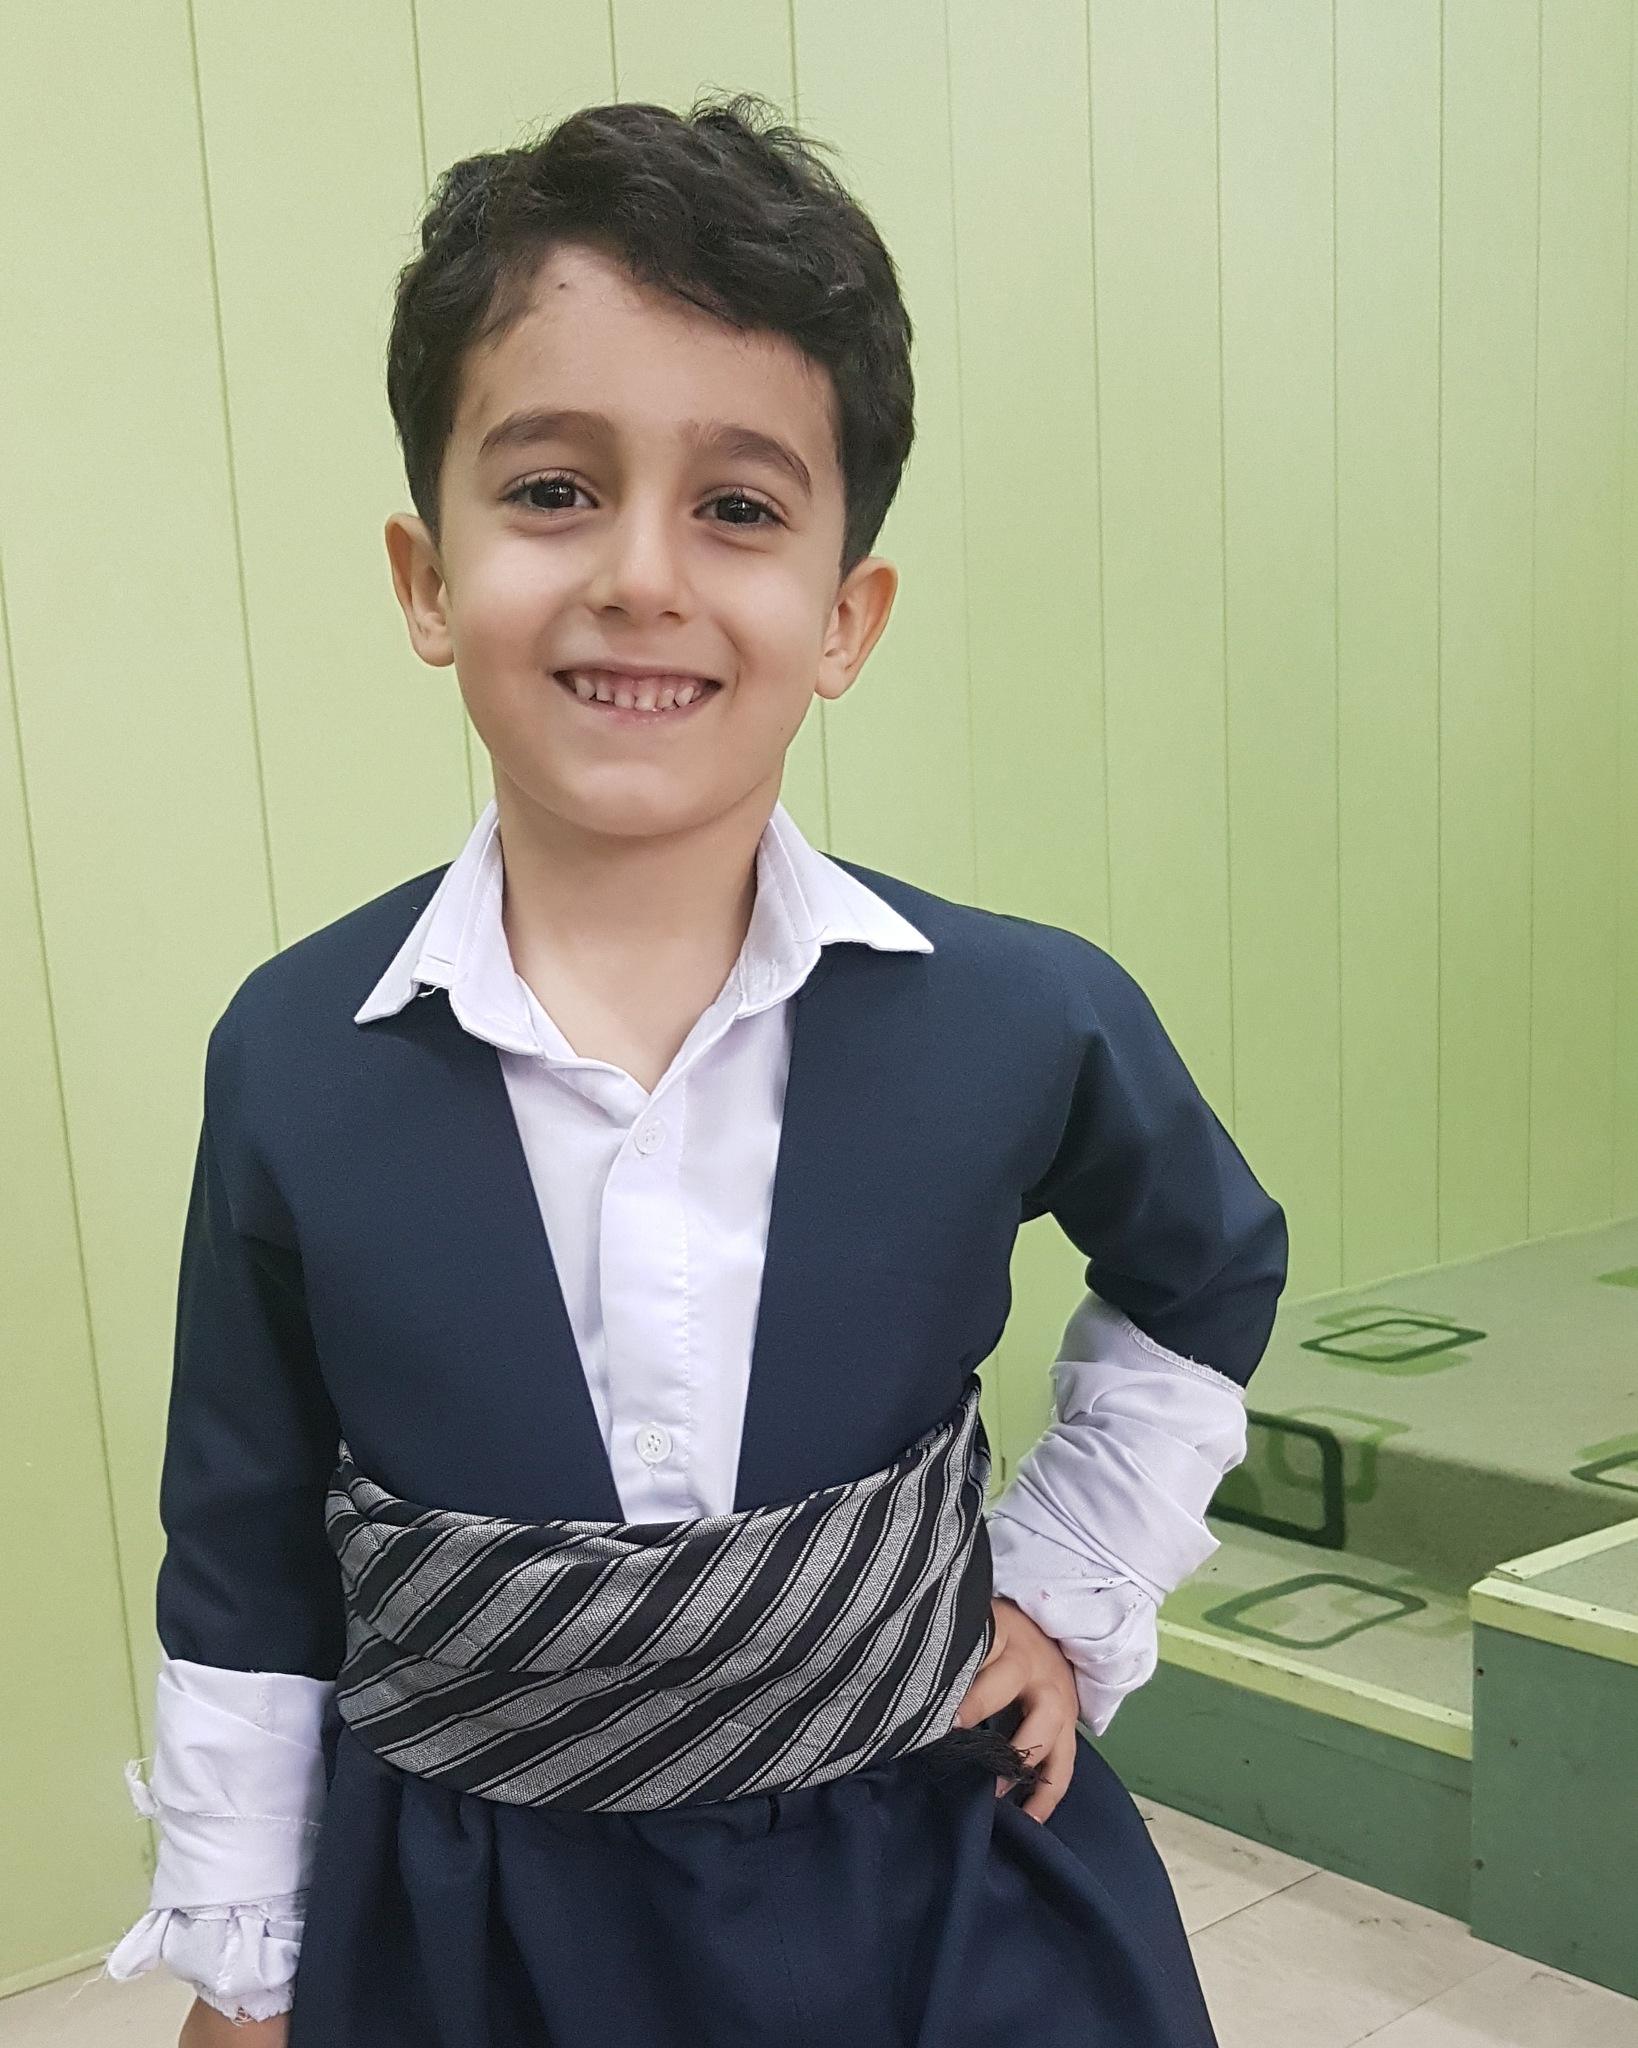 Iranian kurd boy by taherikambiz